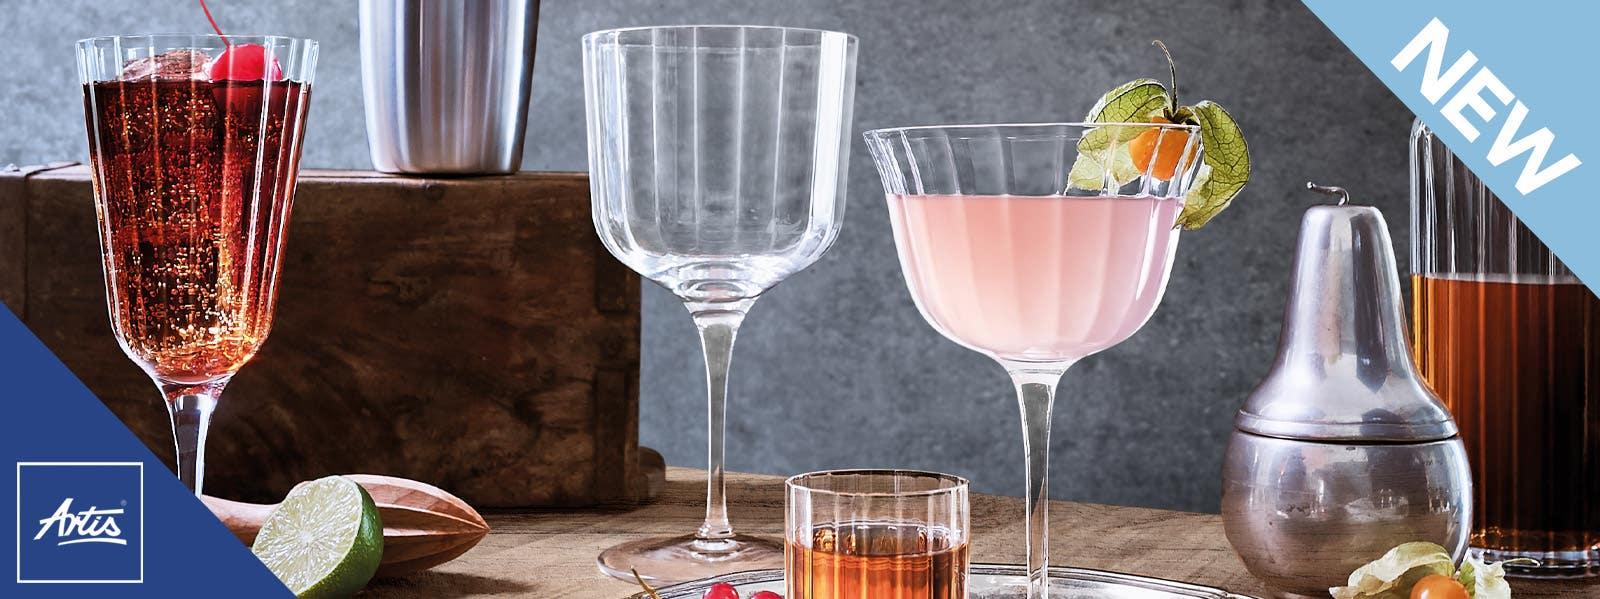 Artis Bach Vintage Glassware